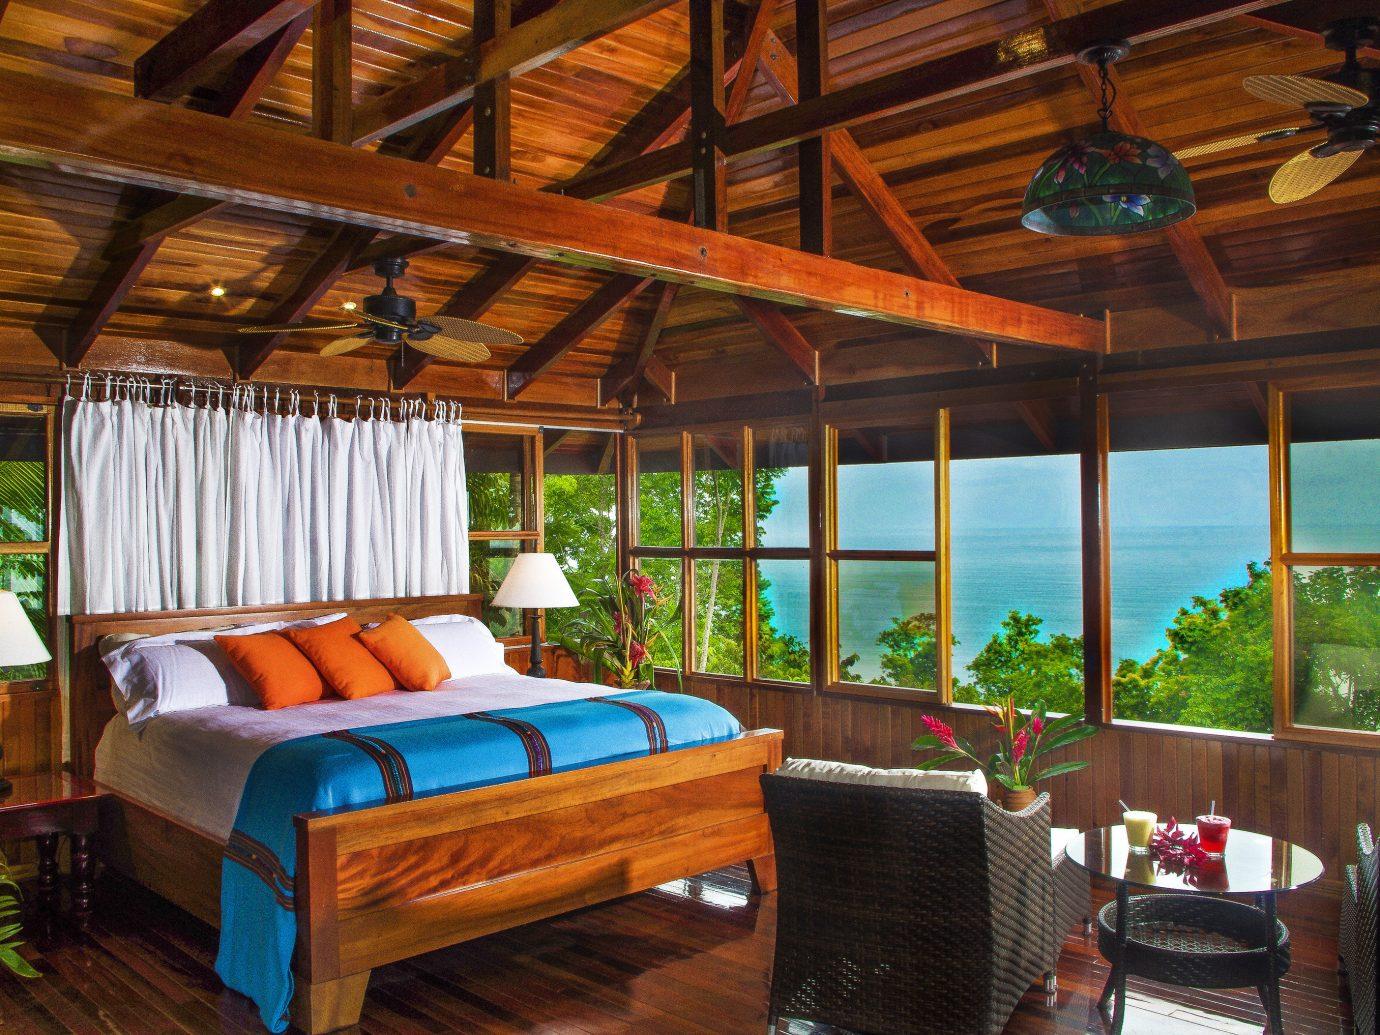 Bedroom at La Paloma Lodge - Costa Rica Osa Peninsula